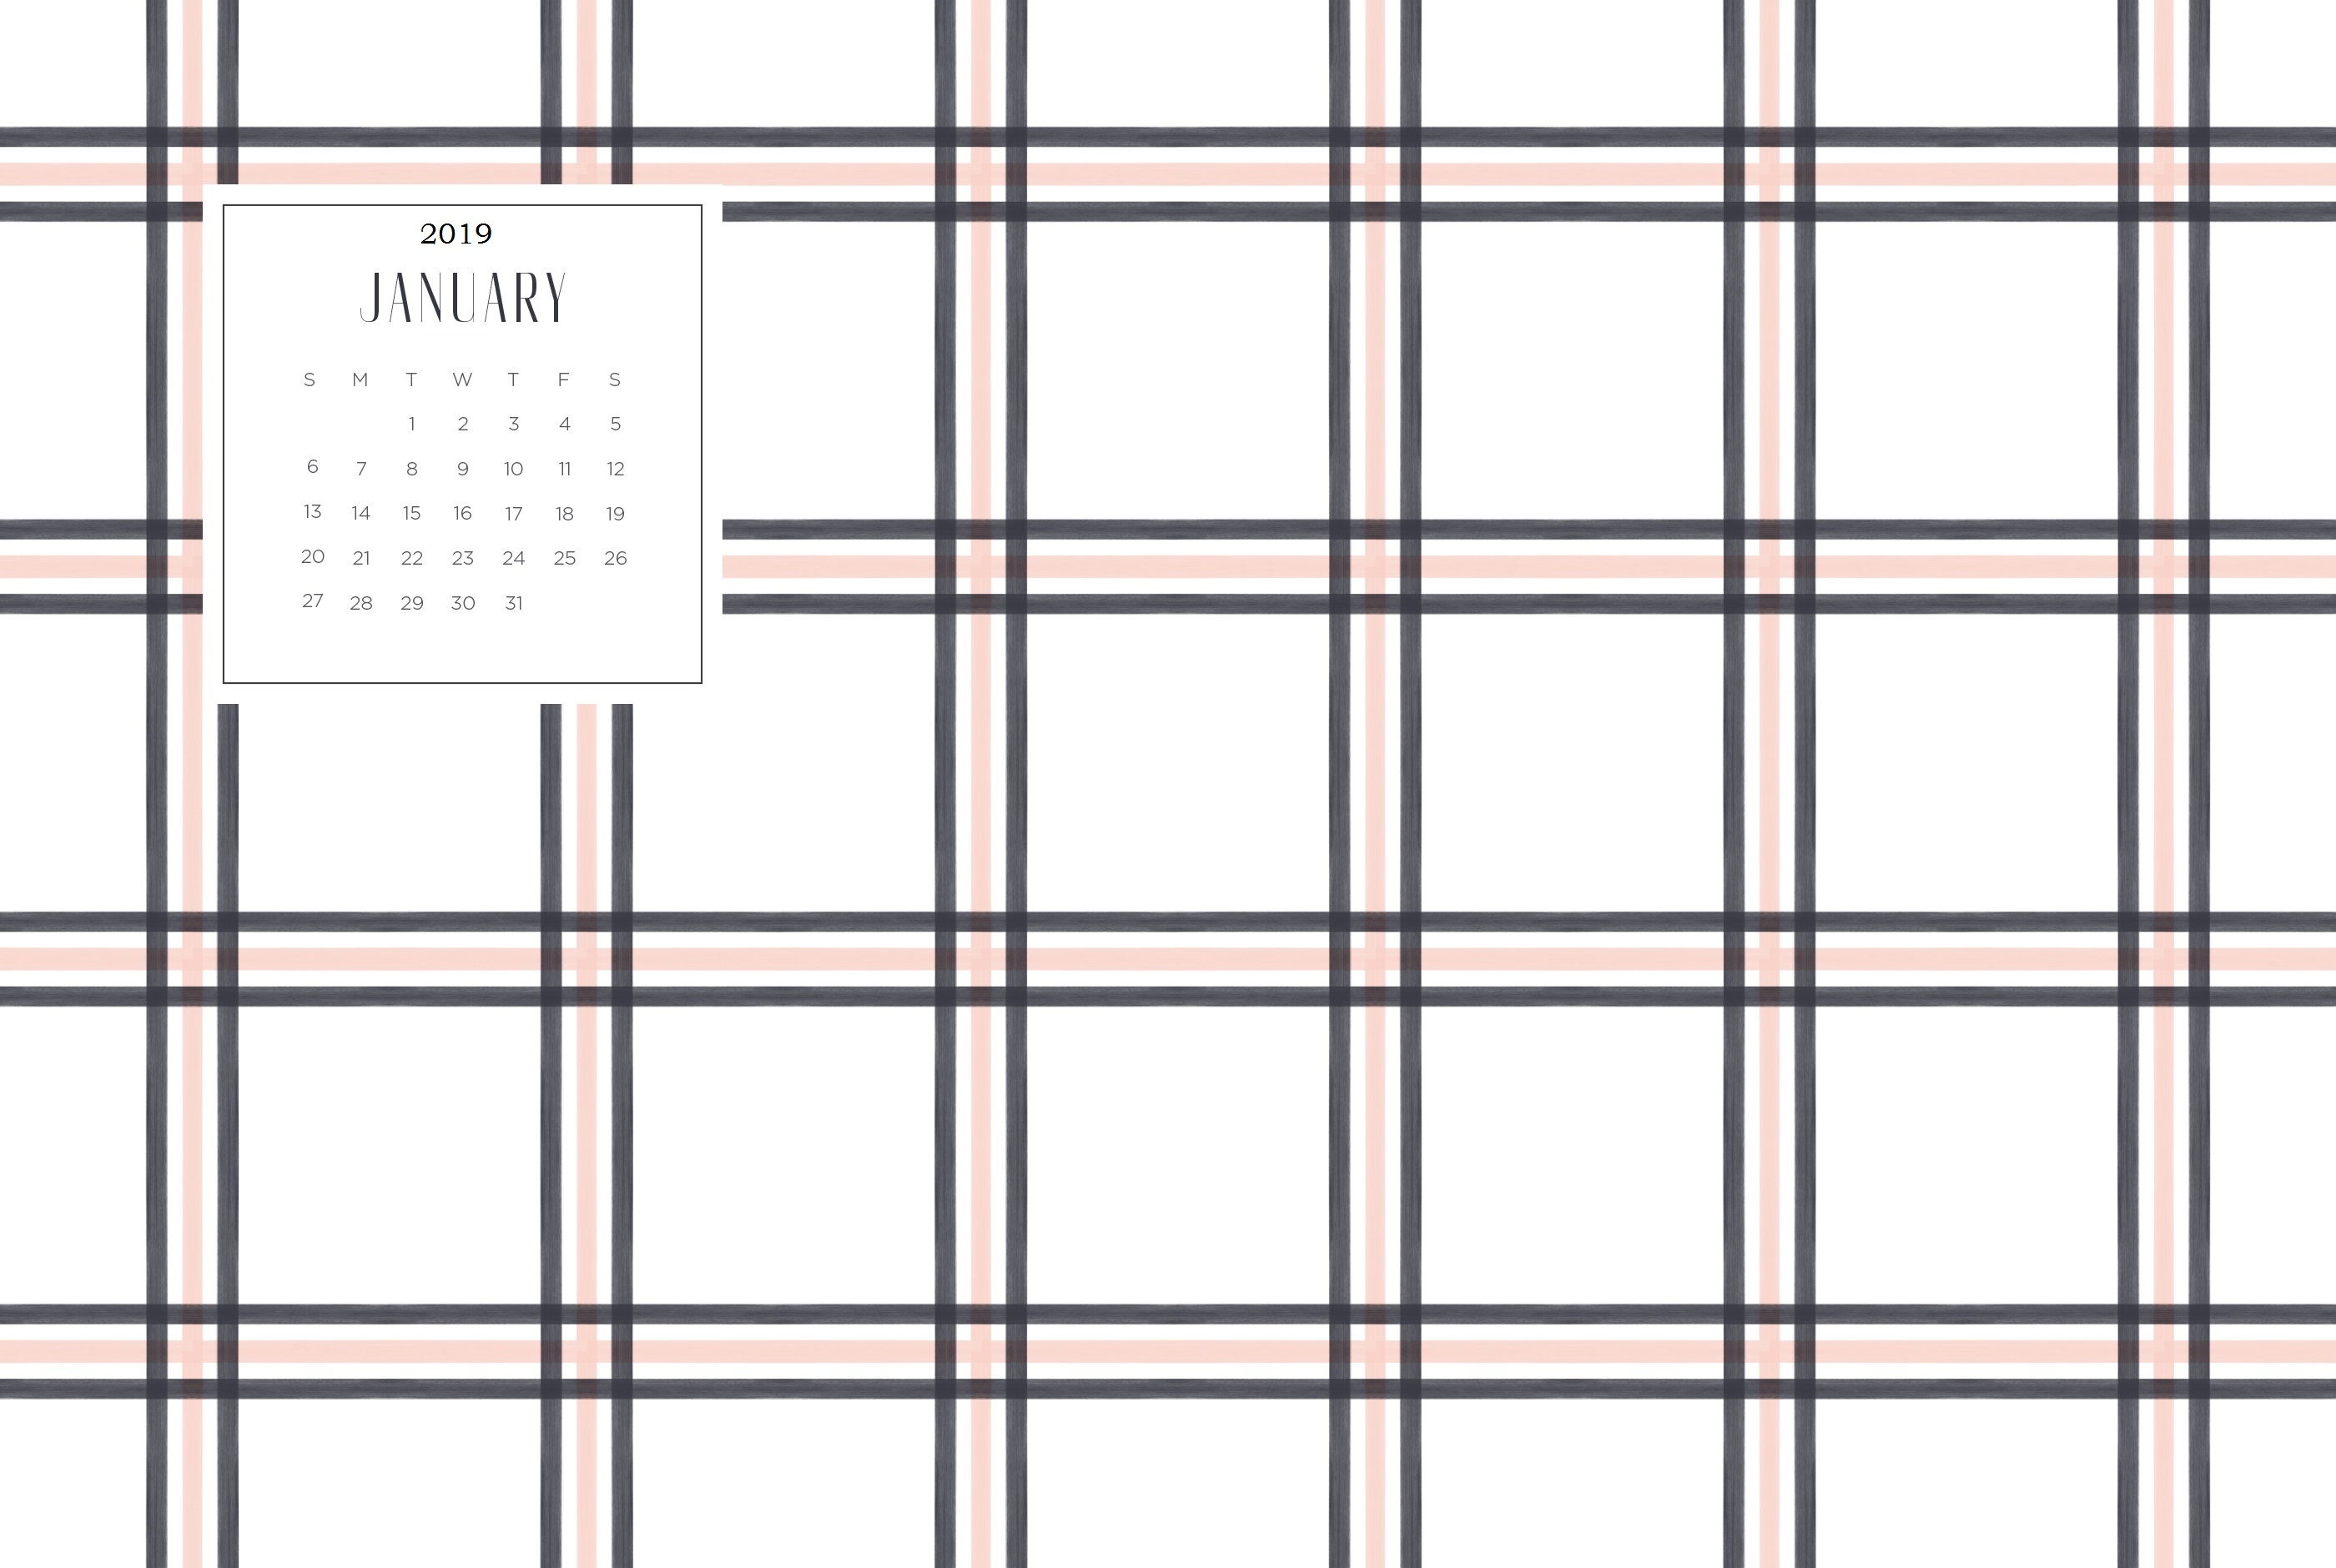 January 2019 HD Calendar Wallpapers Calendar 2019 2800x1880